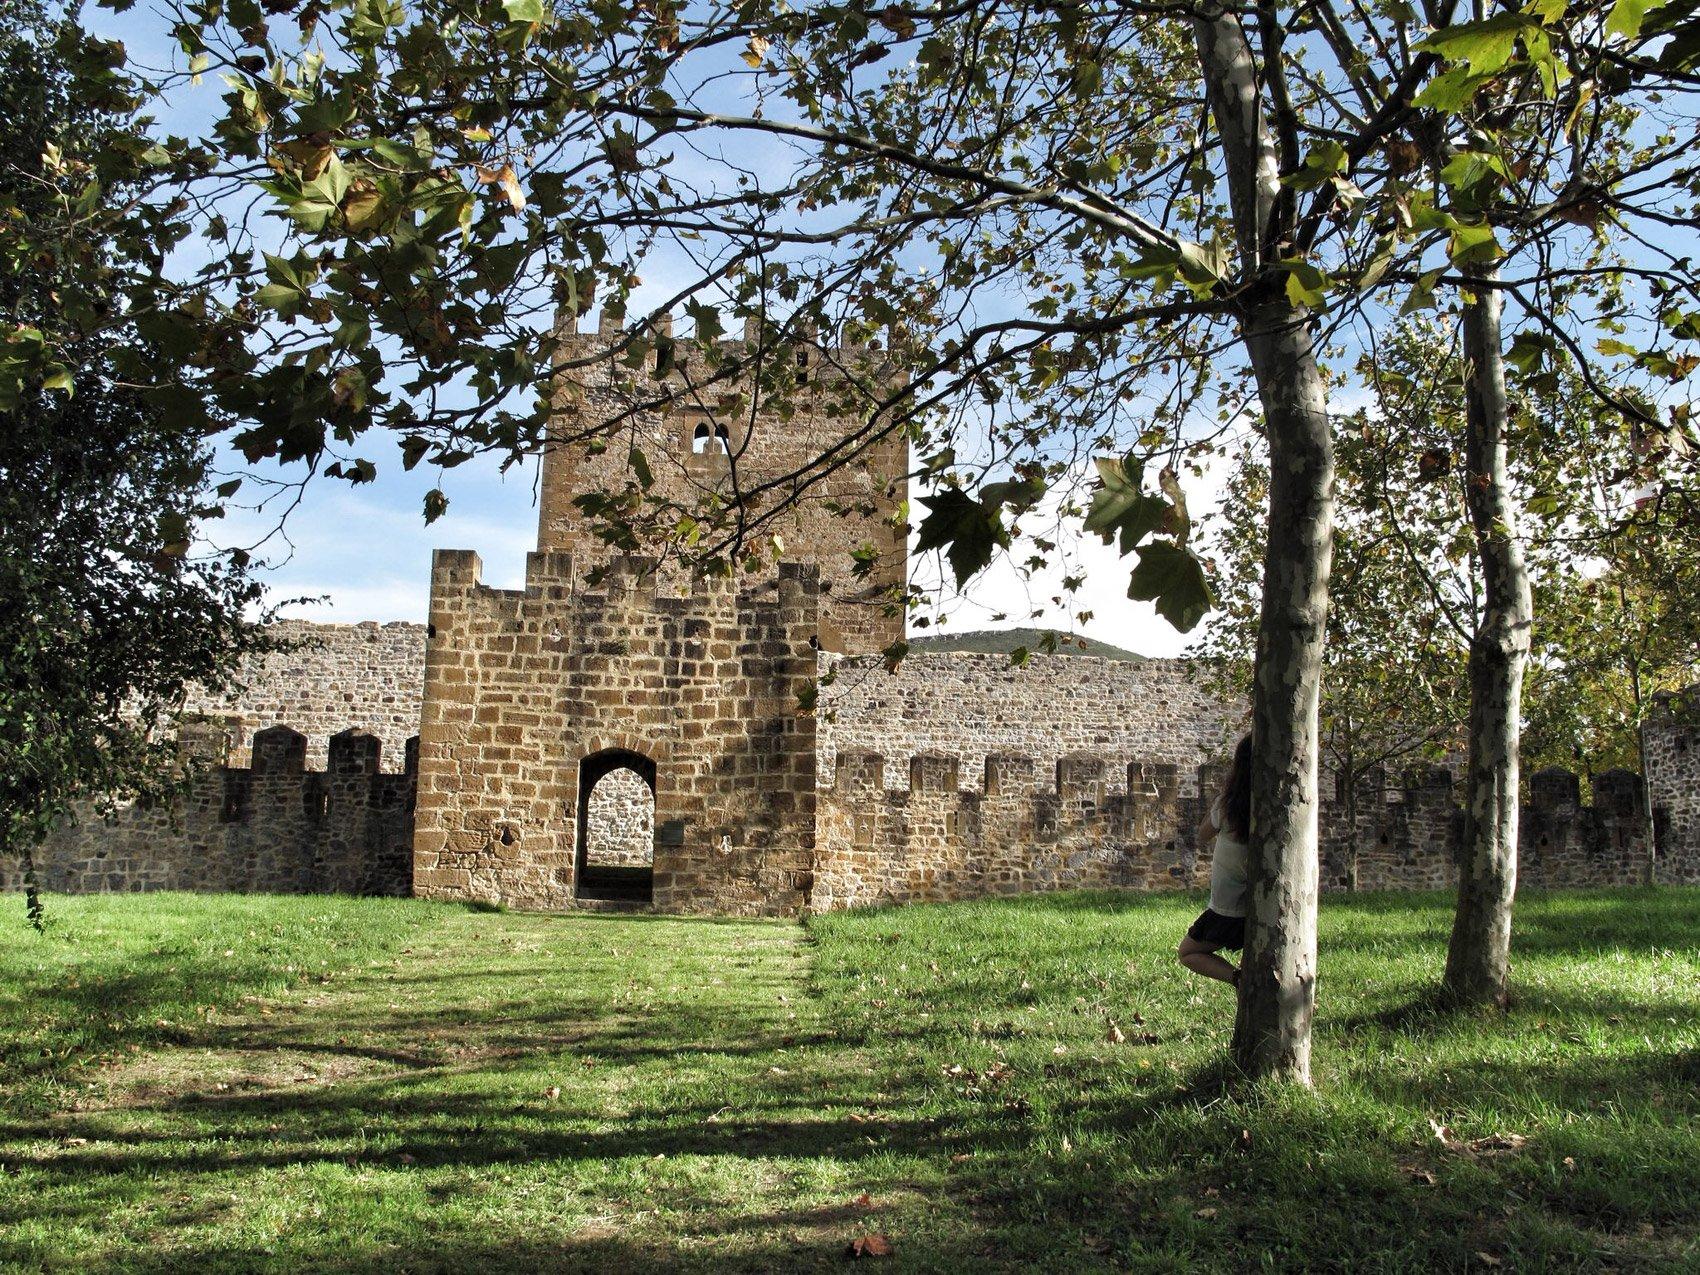 Castillo de Muñatones, Muskiz (Bizkaia)